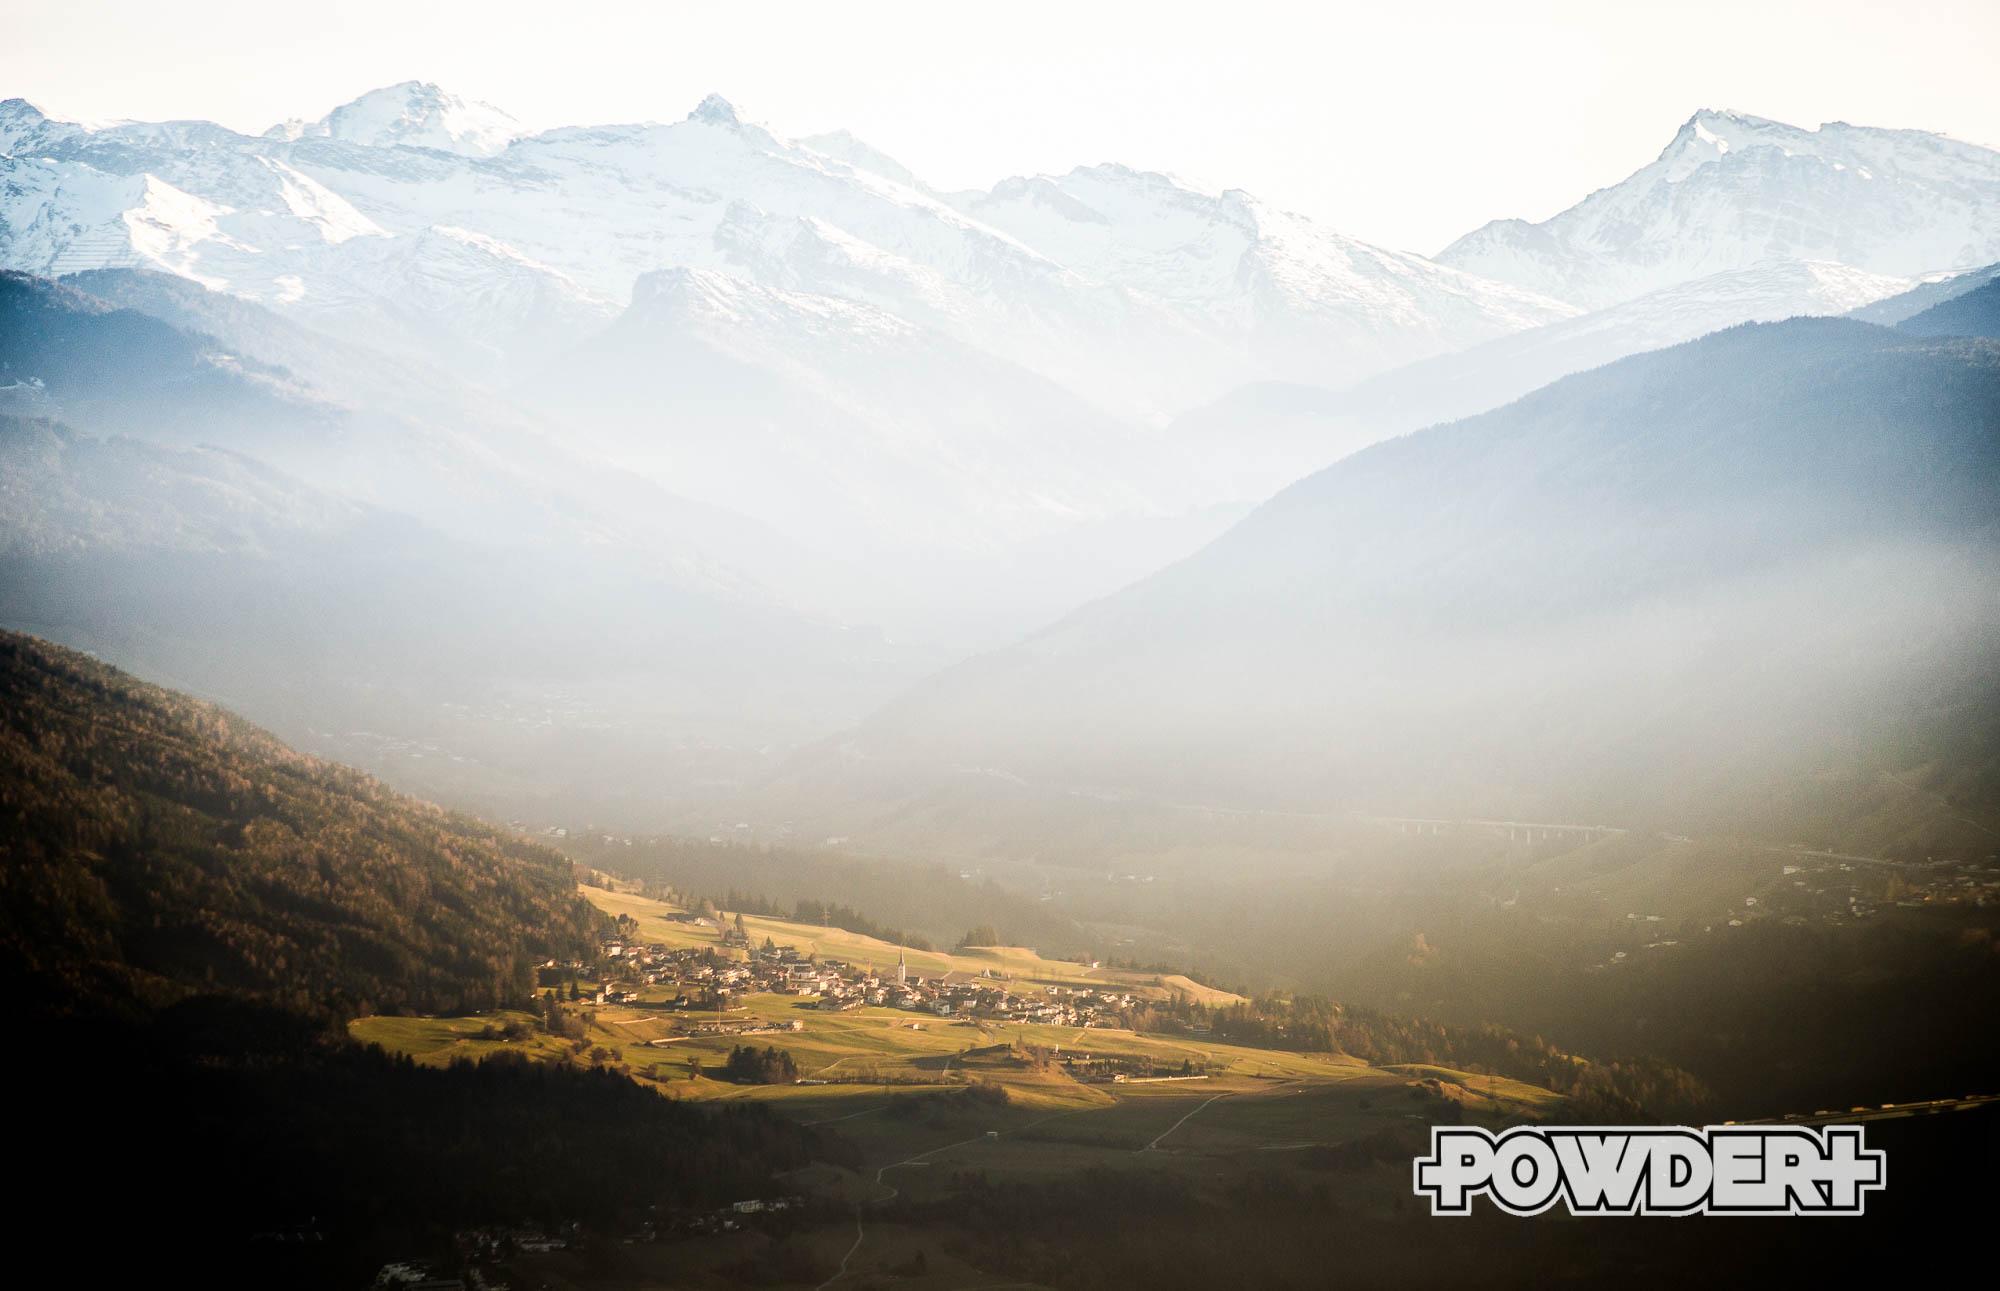 Seltsame Randsportarten Herbstskifahren Powder